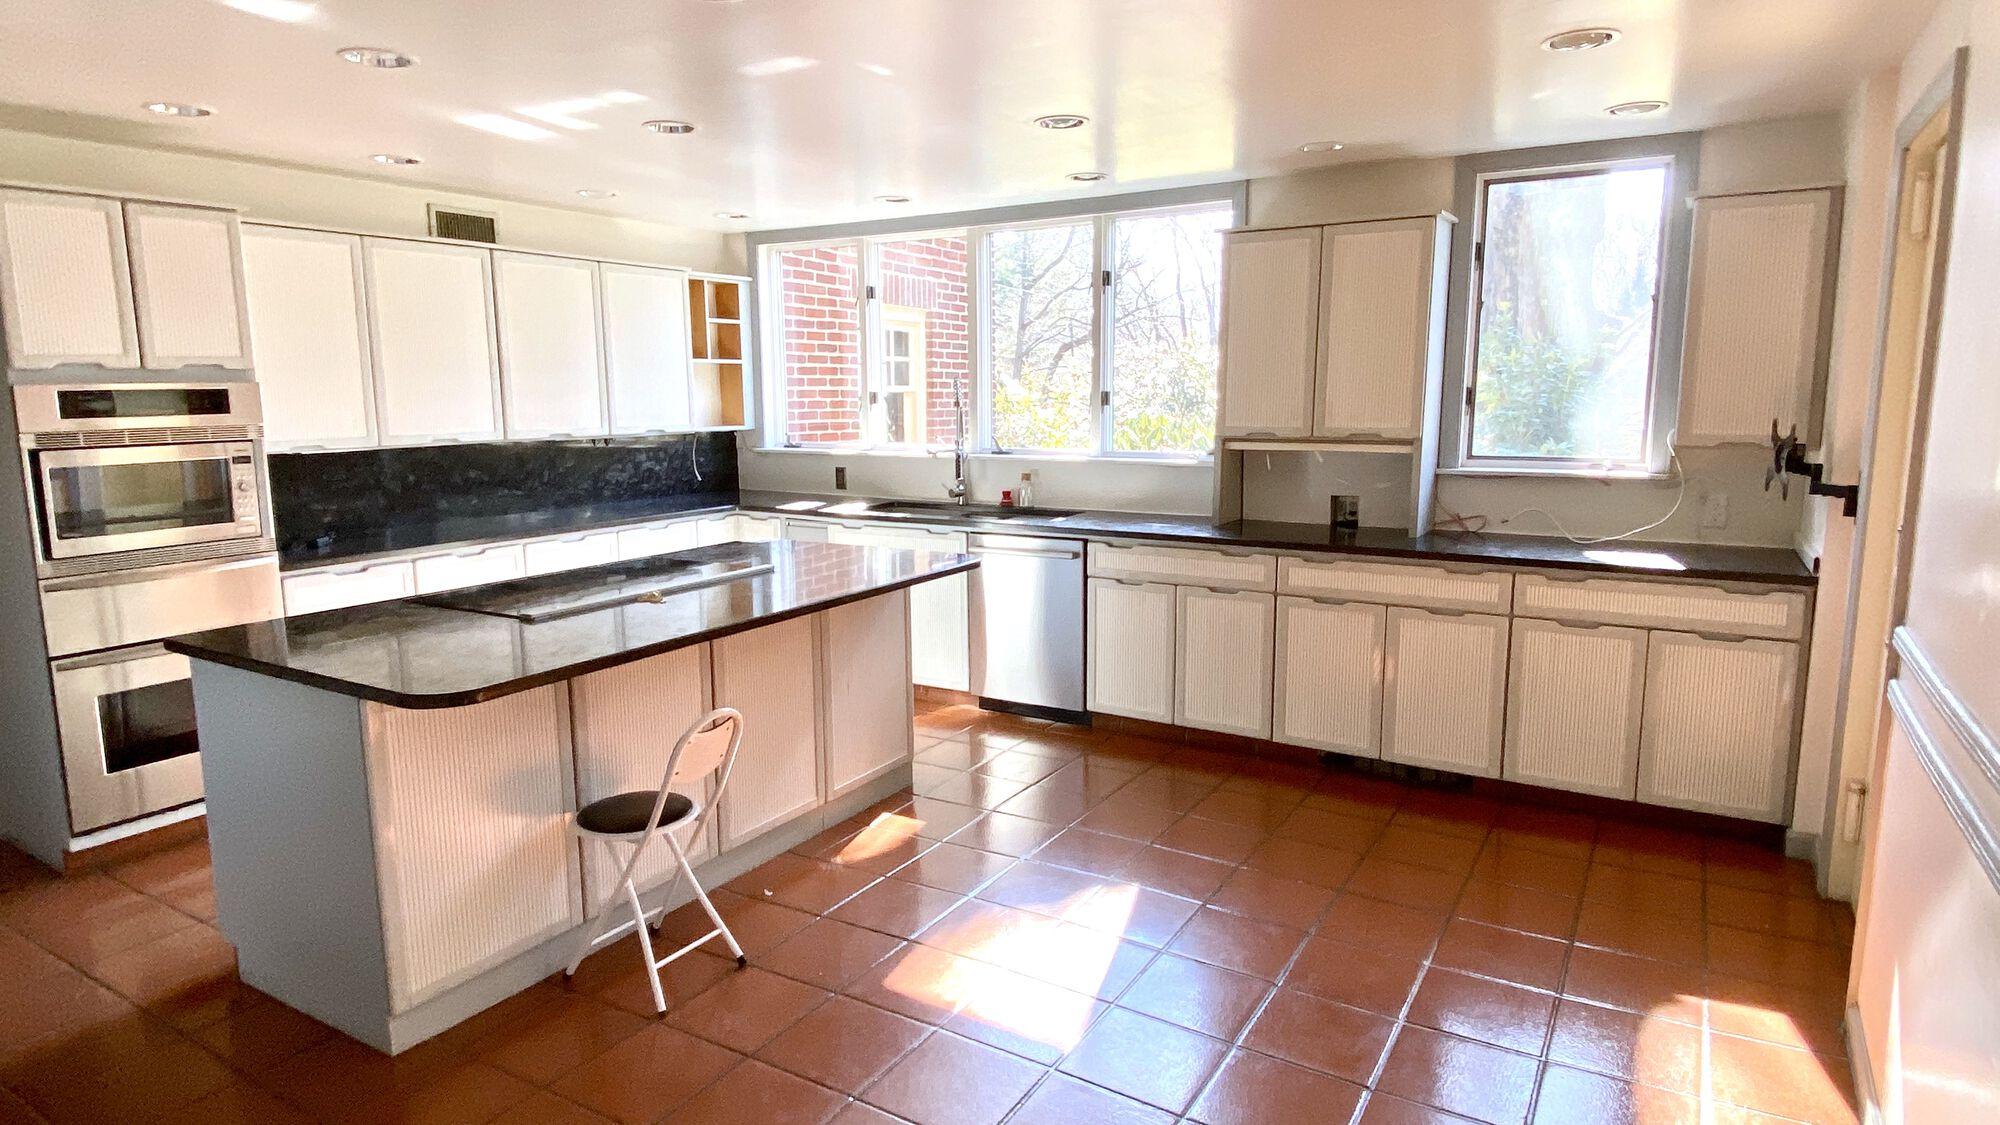 Kitchen Renovation with Fabuwood Full Overlay Wood Cabinets, Open Shelving, Quartz Countertops, Oak Hardwood Flooring in West Orange, Essex County NJ